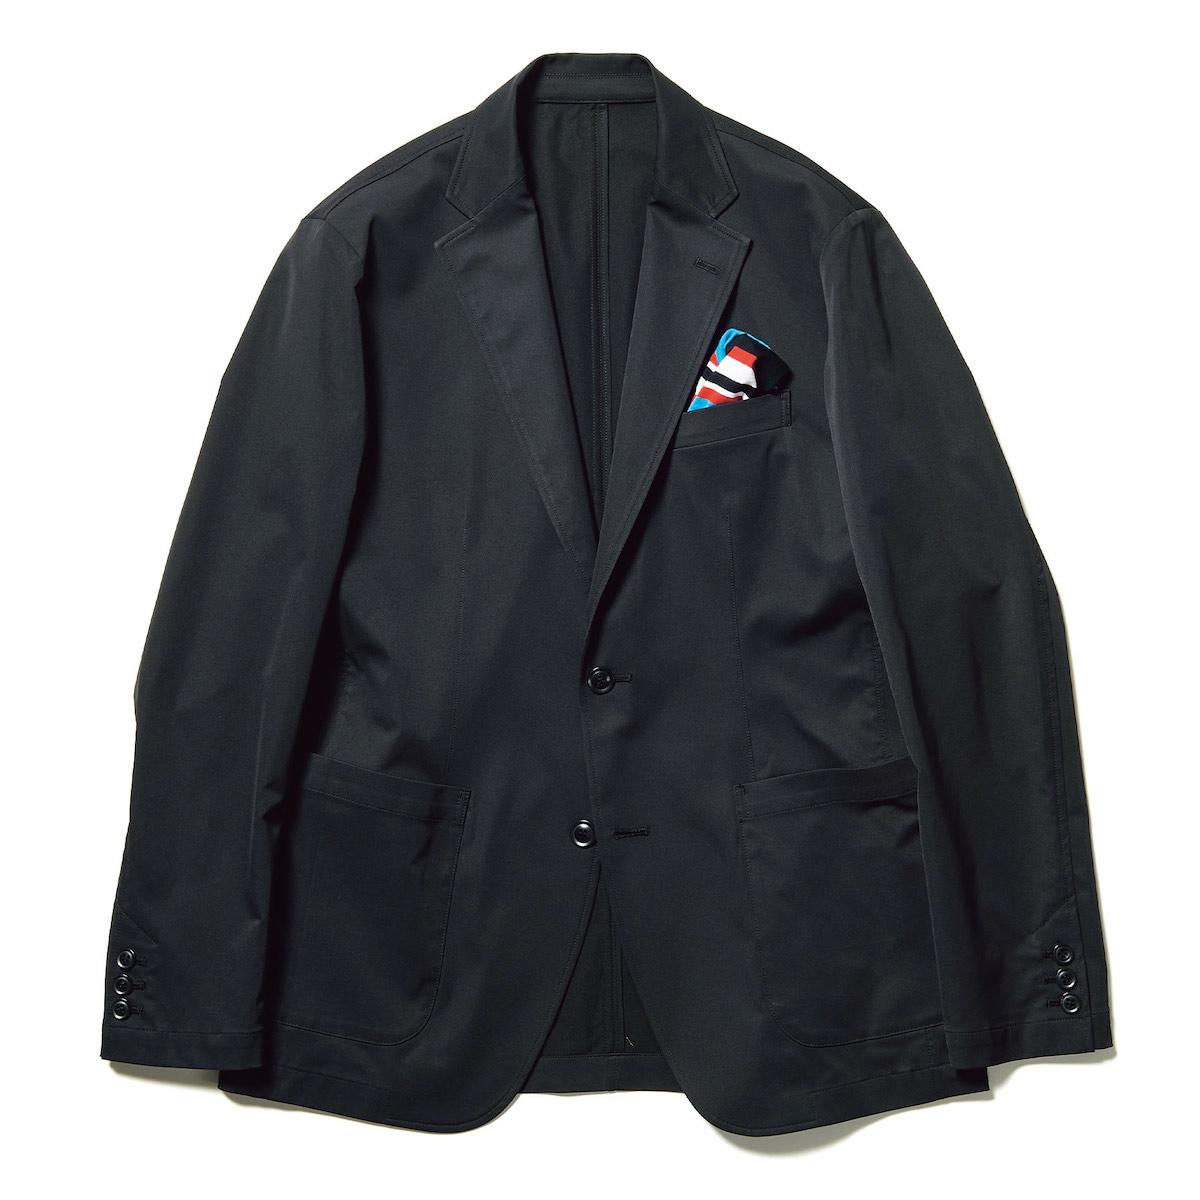 uniform experiment / SOLOTEX STRETCH TWILL 2BUTTON JACKET (Black)